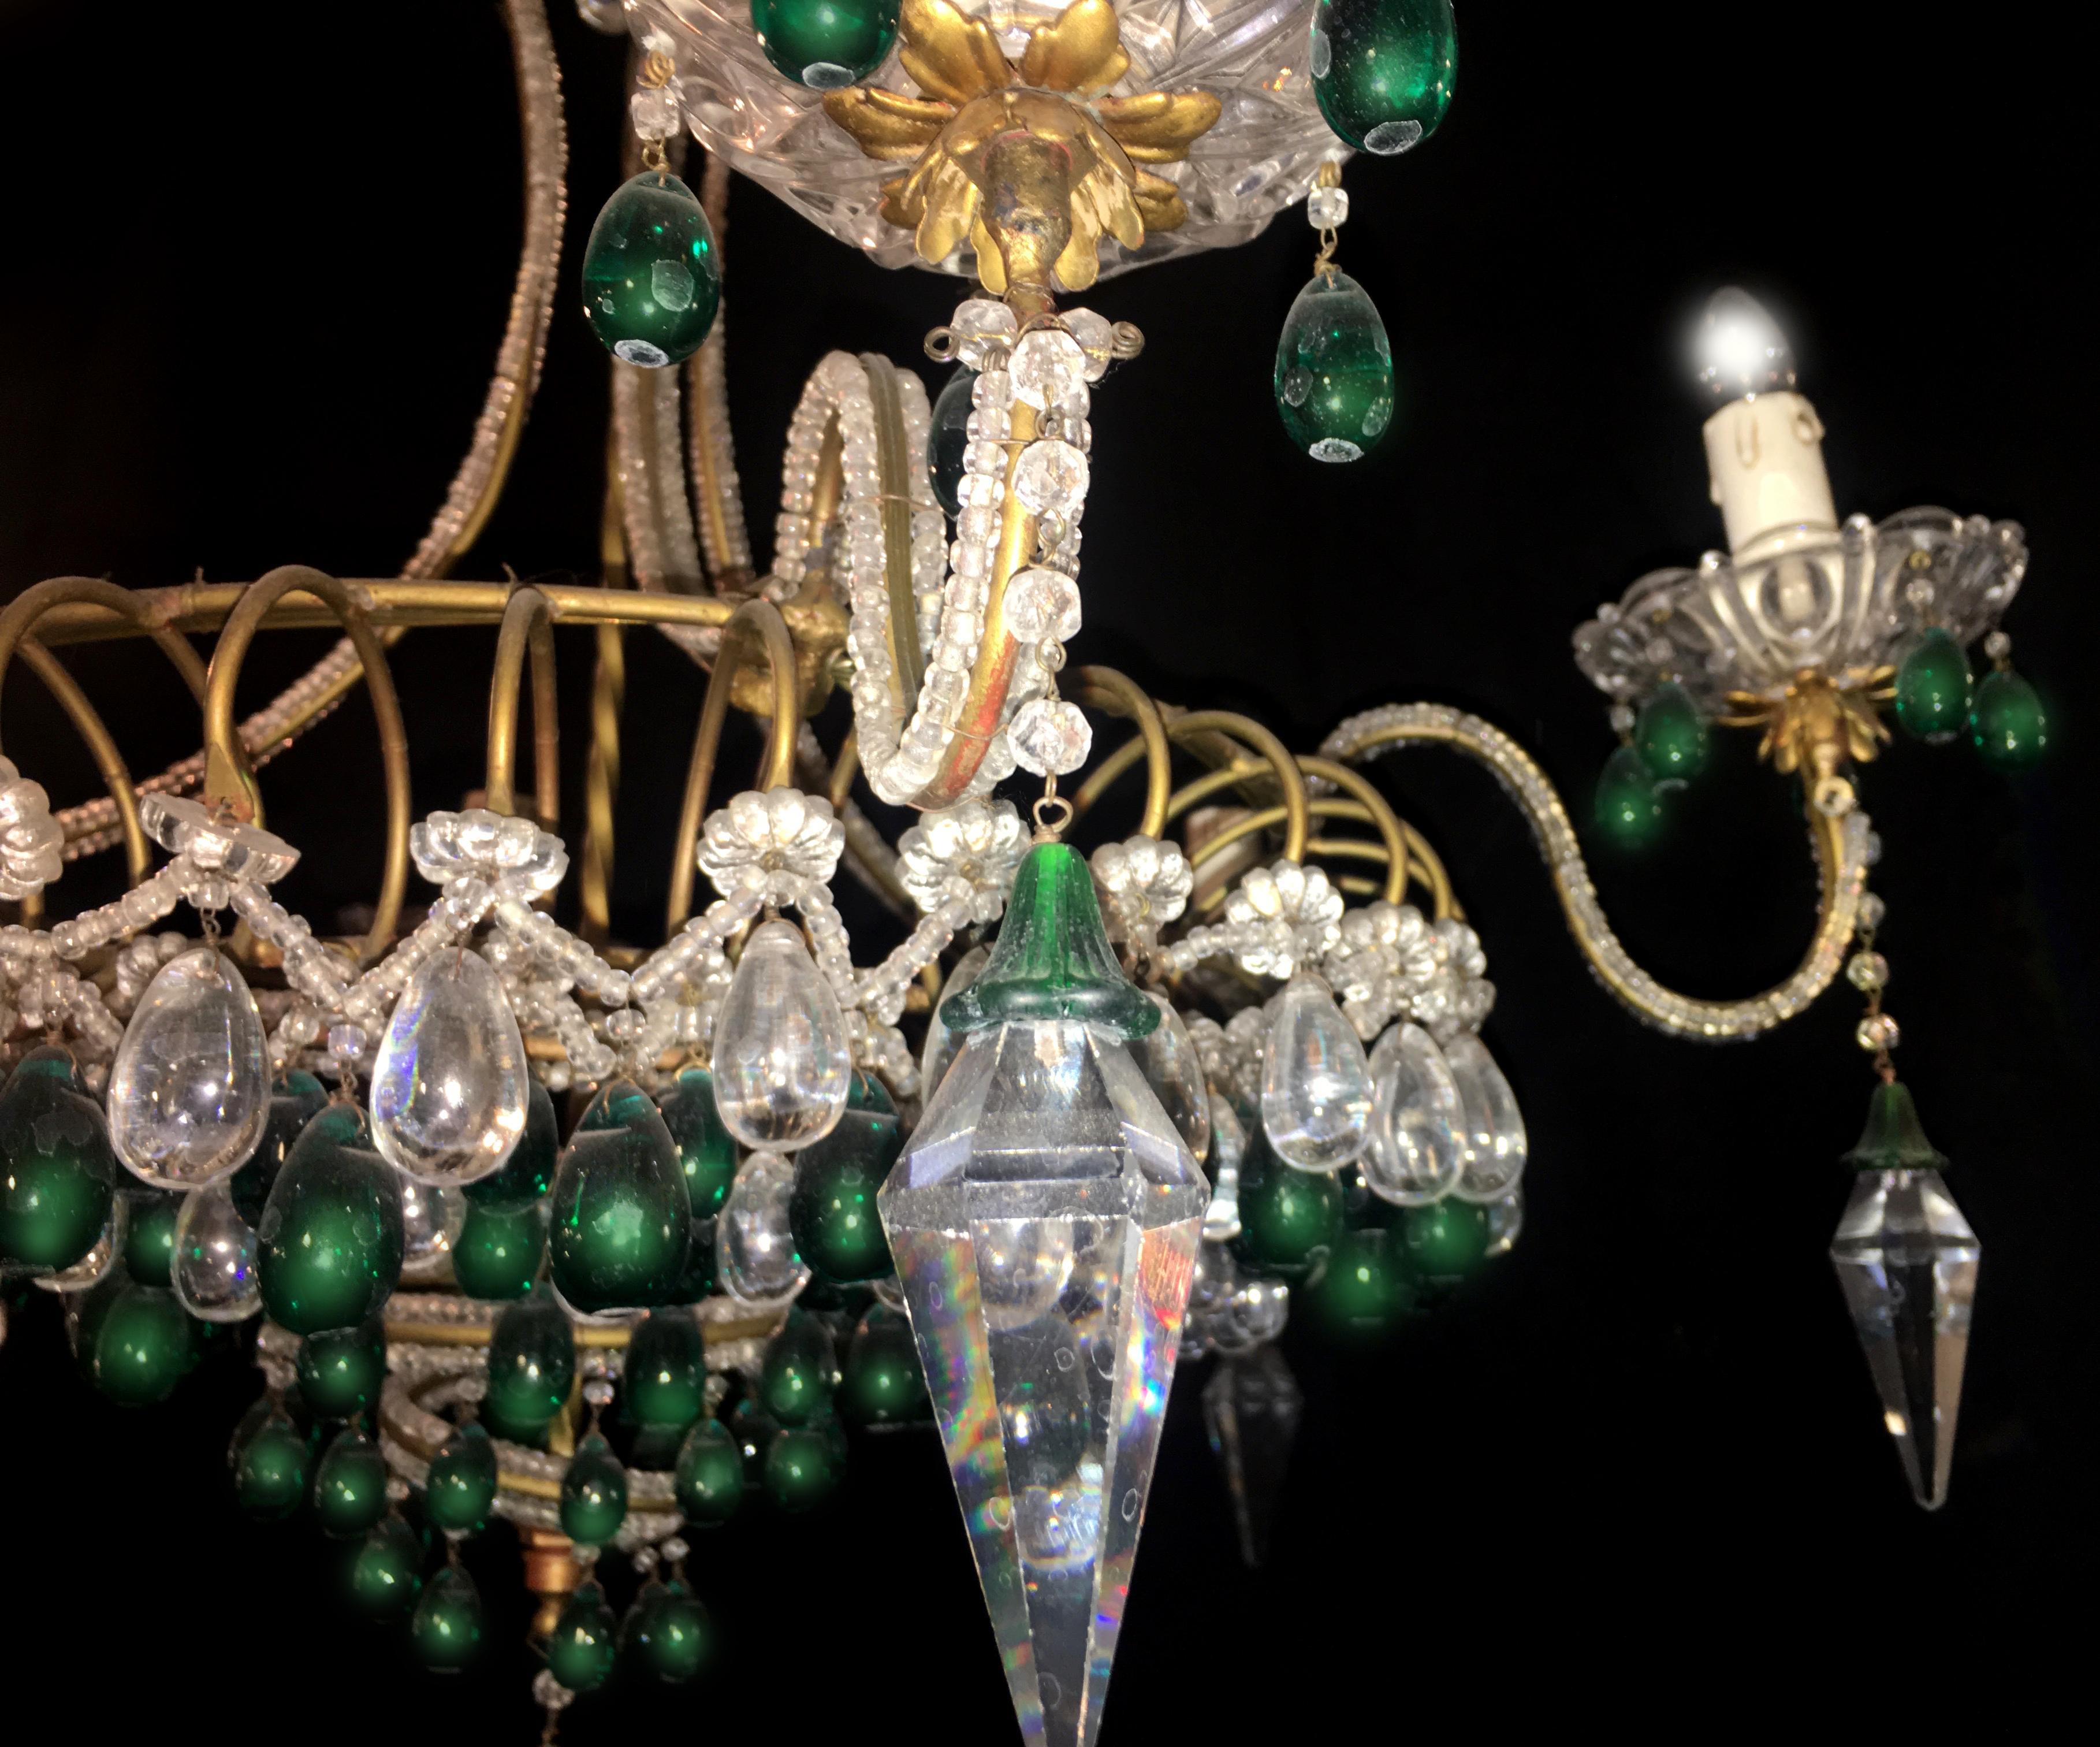 Kronleuchter Murano ~ Murano kronleuchter kristalllüster prunklüster leuchter messing